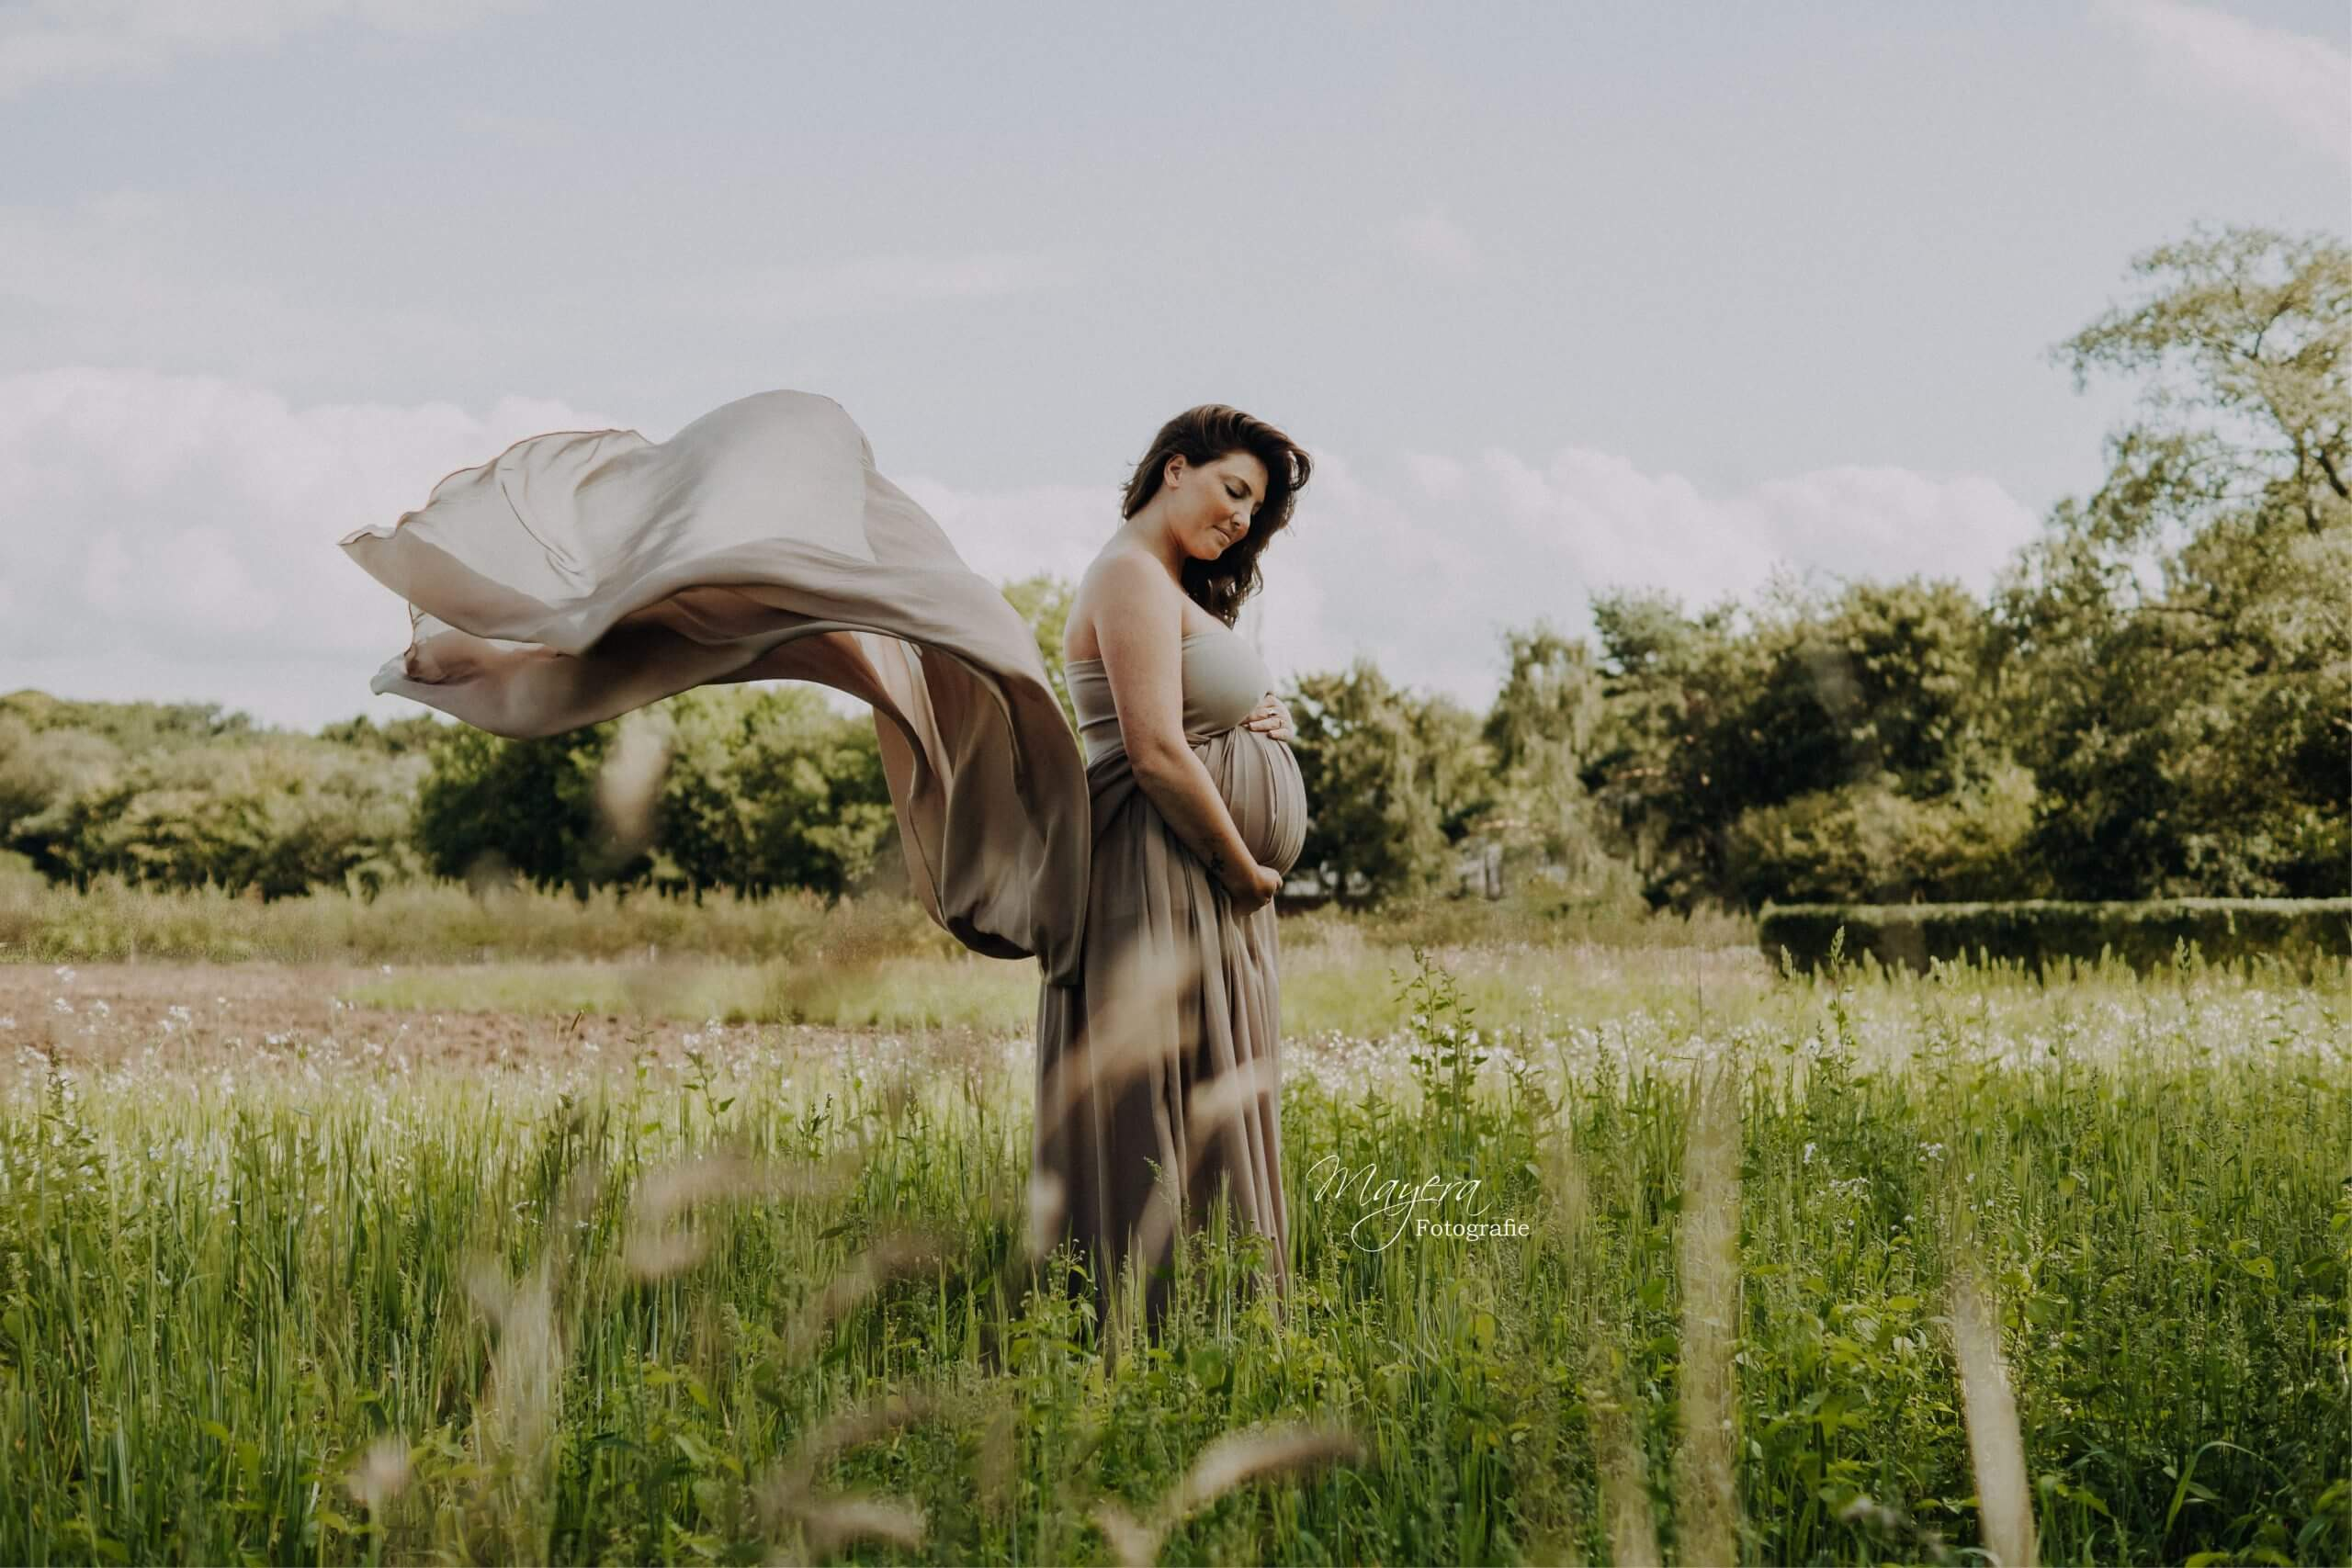 romantisch vintage fotoshoot zwangerschap 3